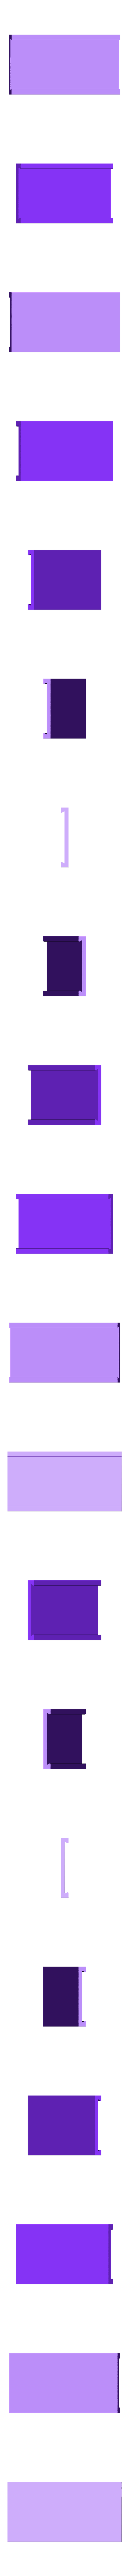 Led2.stl Download free STL file WS2812 led shade • 3D print design, DK7